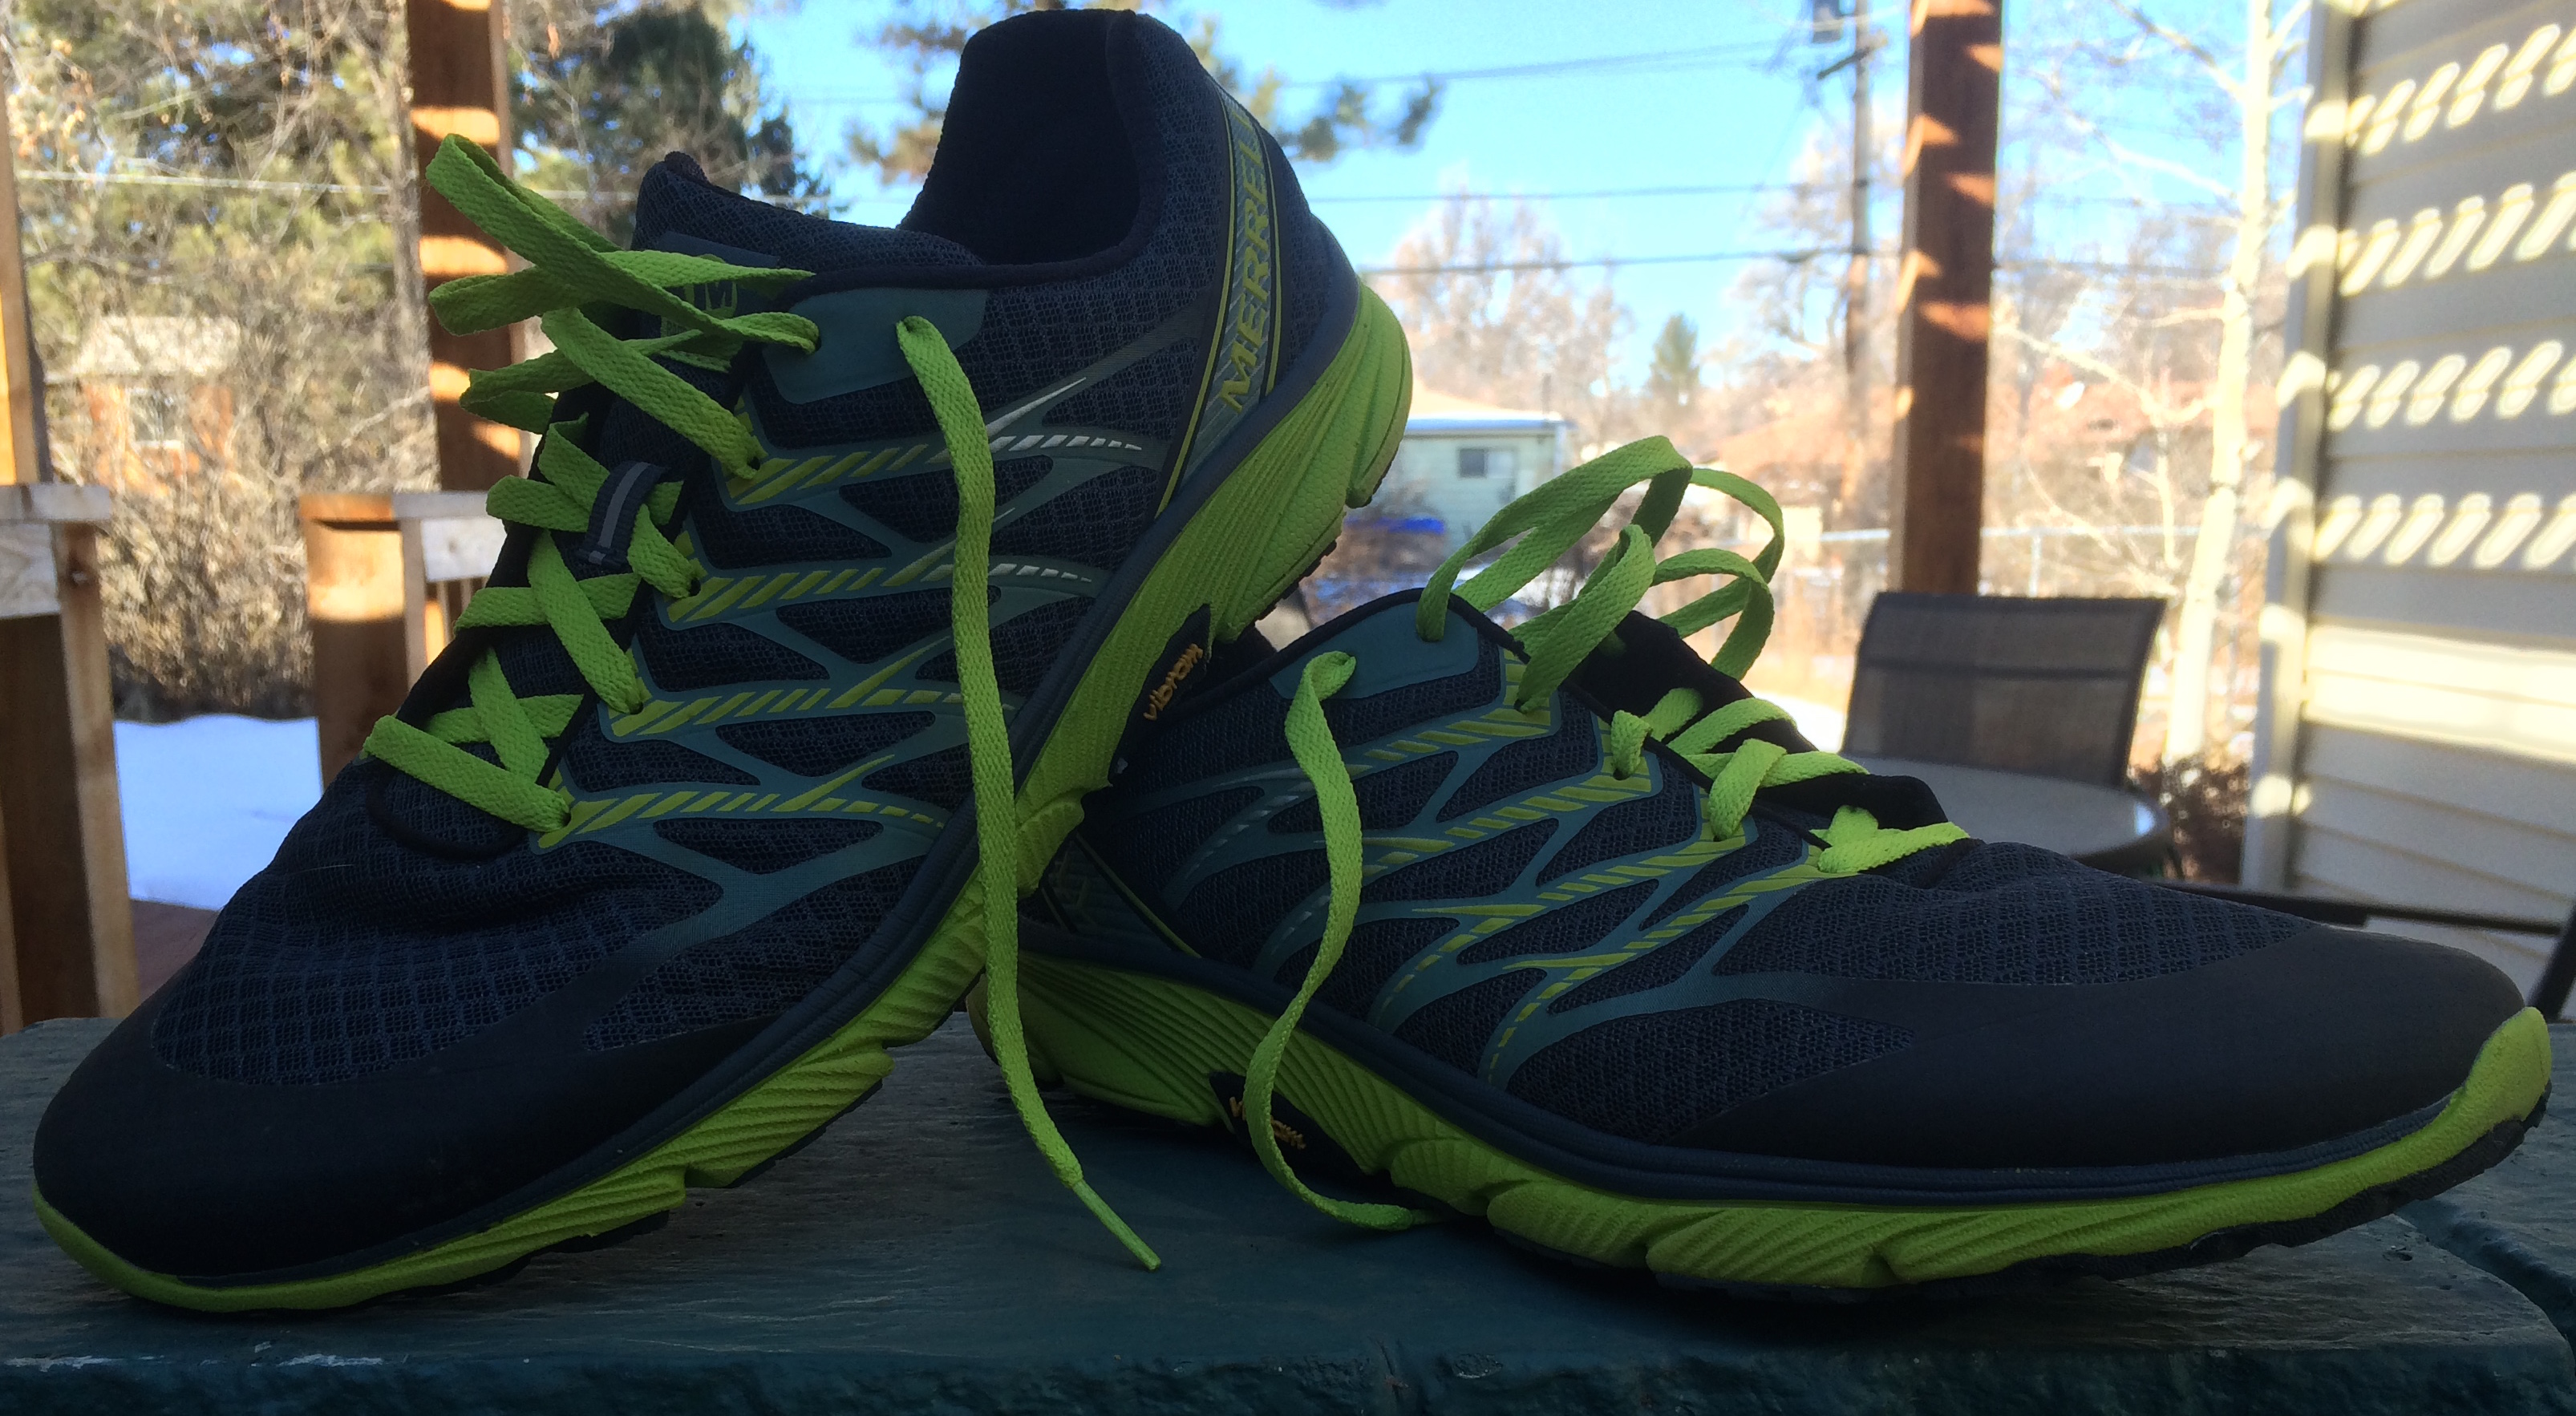 nike shipping lifestyle running sneakers shoes lunarepic most wmns en comfortable express flyknit sivasdescalzo buy comforter online nikelab